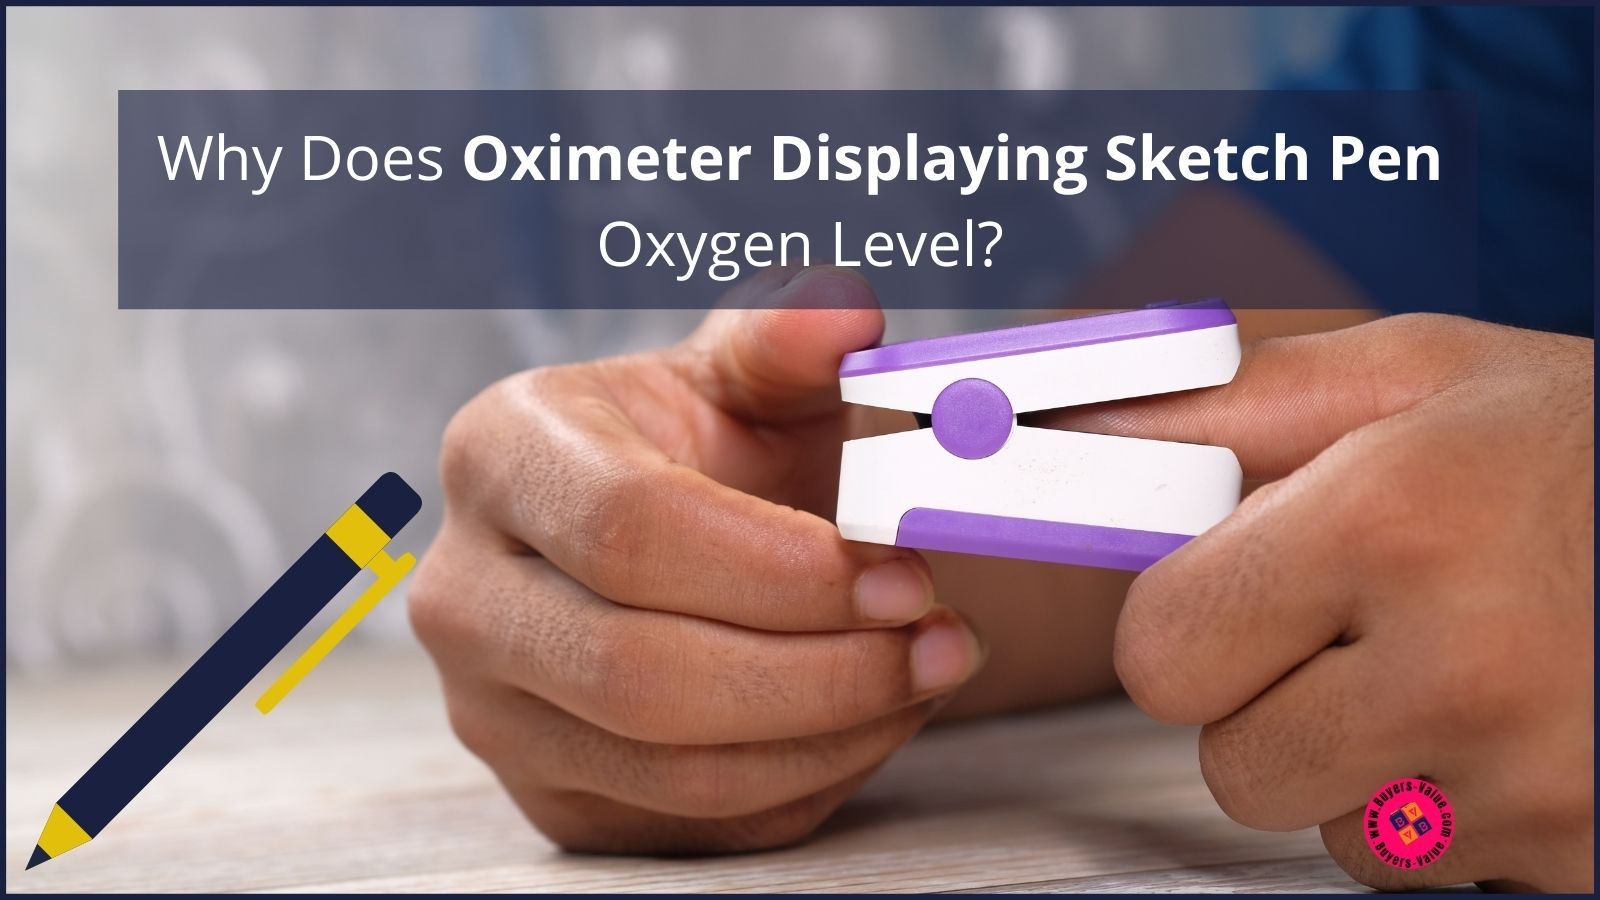 Oximeter Displaying Sketch Pen Oxygen Level